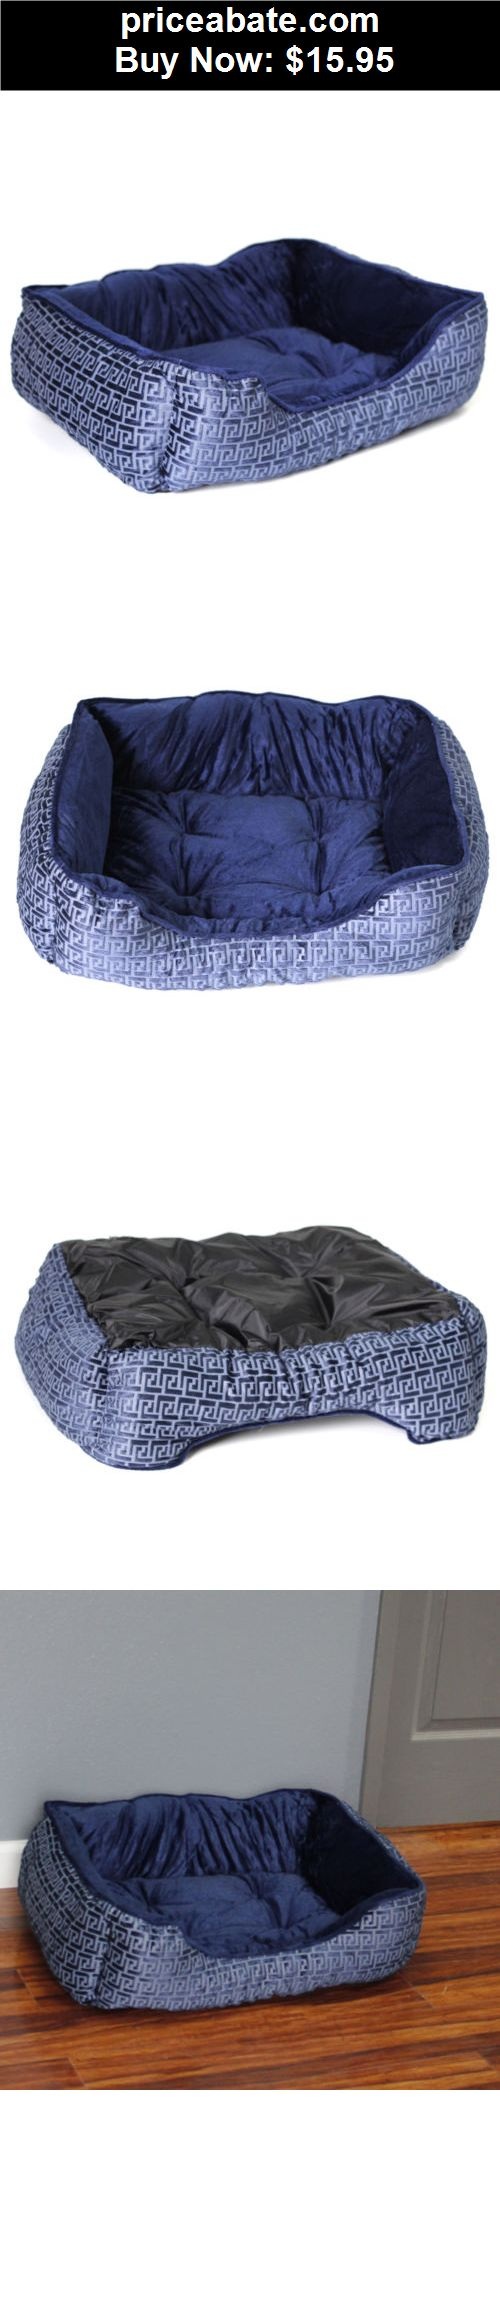 Animals Dog Pet Bed Blue Pad Crate Cuddler Soft Cozy Warm Dog